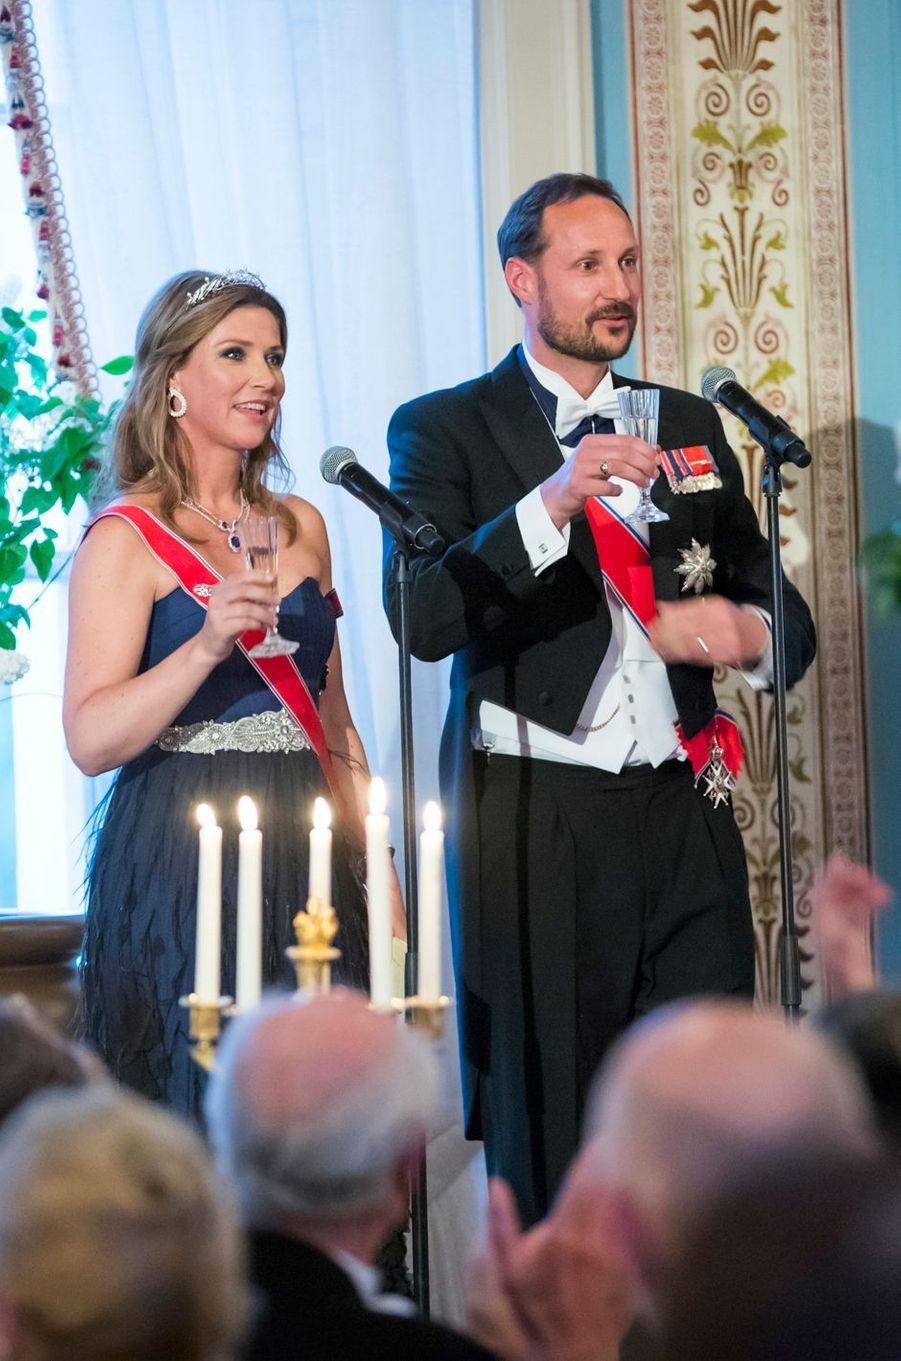 La princesse Märtha-Louise et le prince Haakon de Norvège à Oslo, le 9 mai 2017